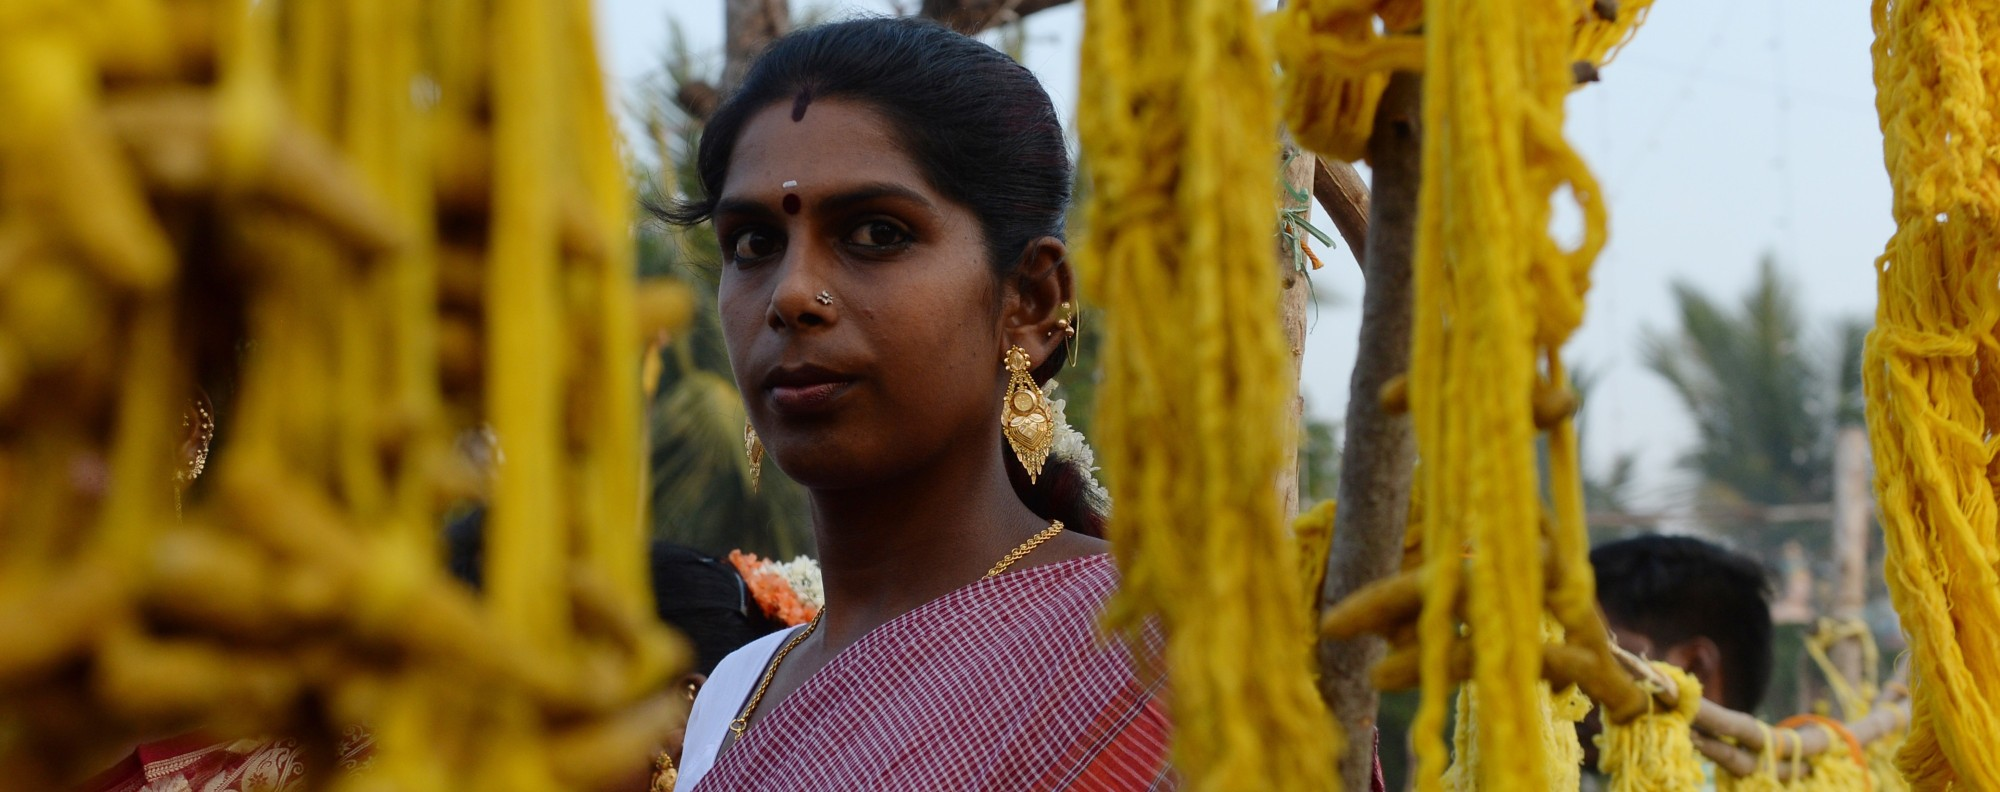 A transgender woman in Tamil Nadu. Photo: AFP